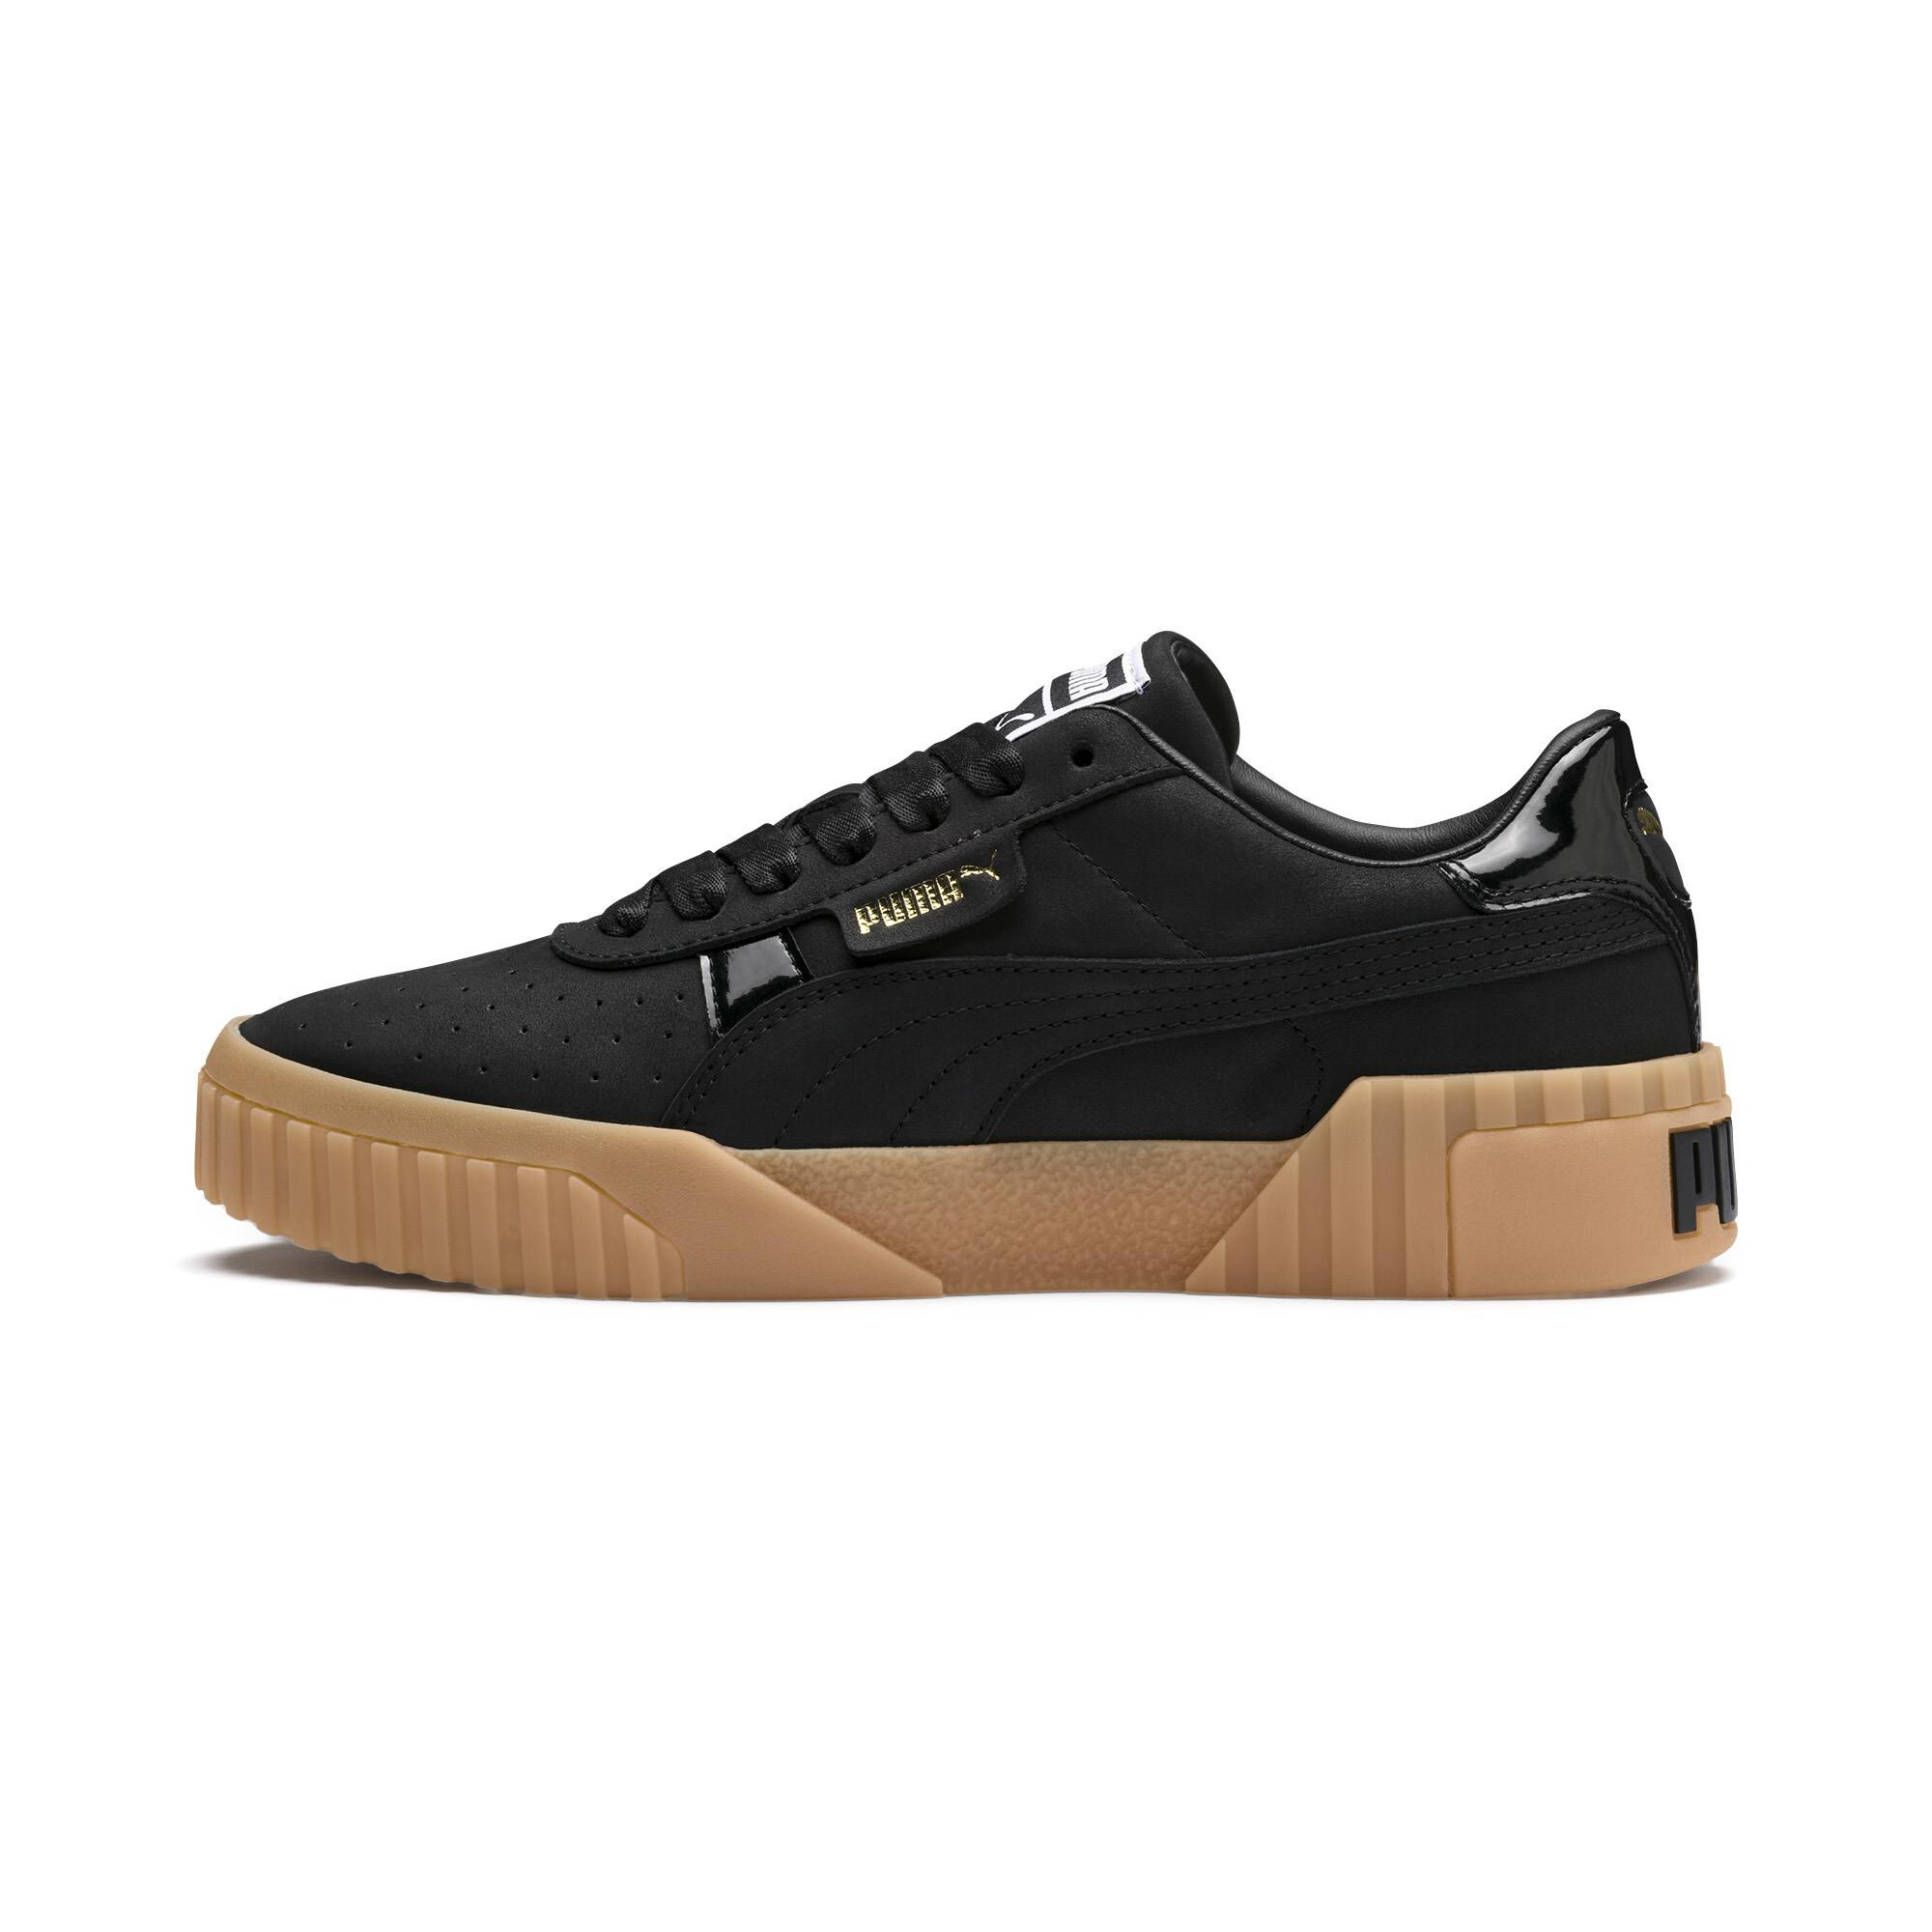 Image Puma Cali Nubuck Women's Sneakers #1